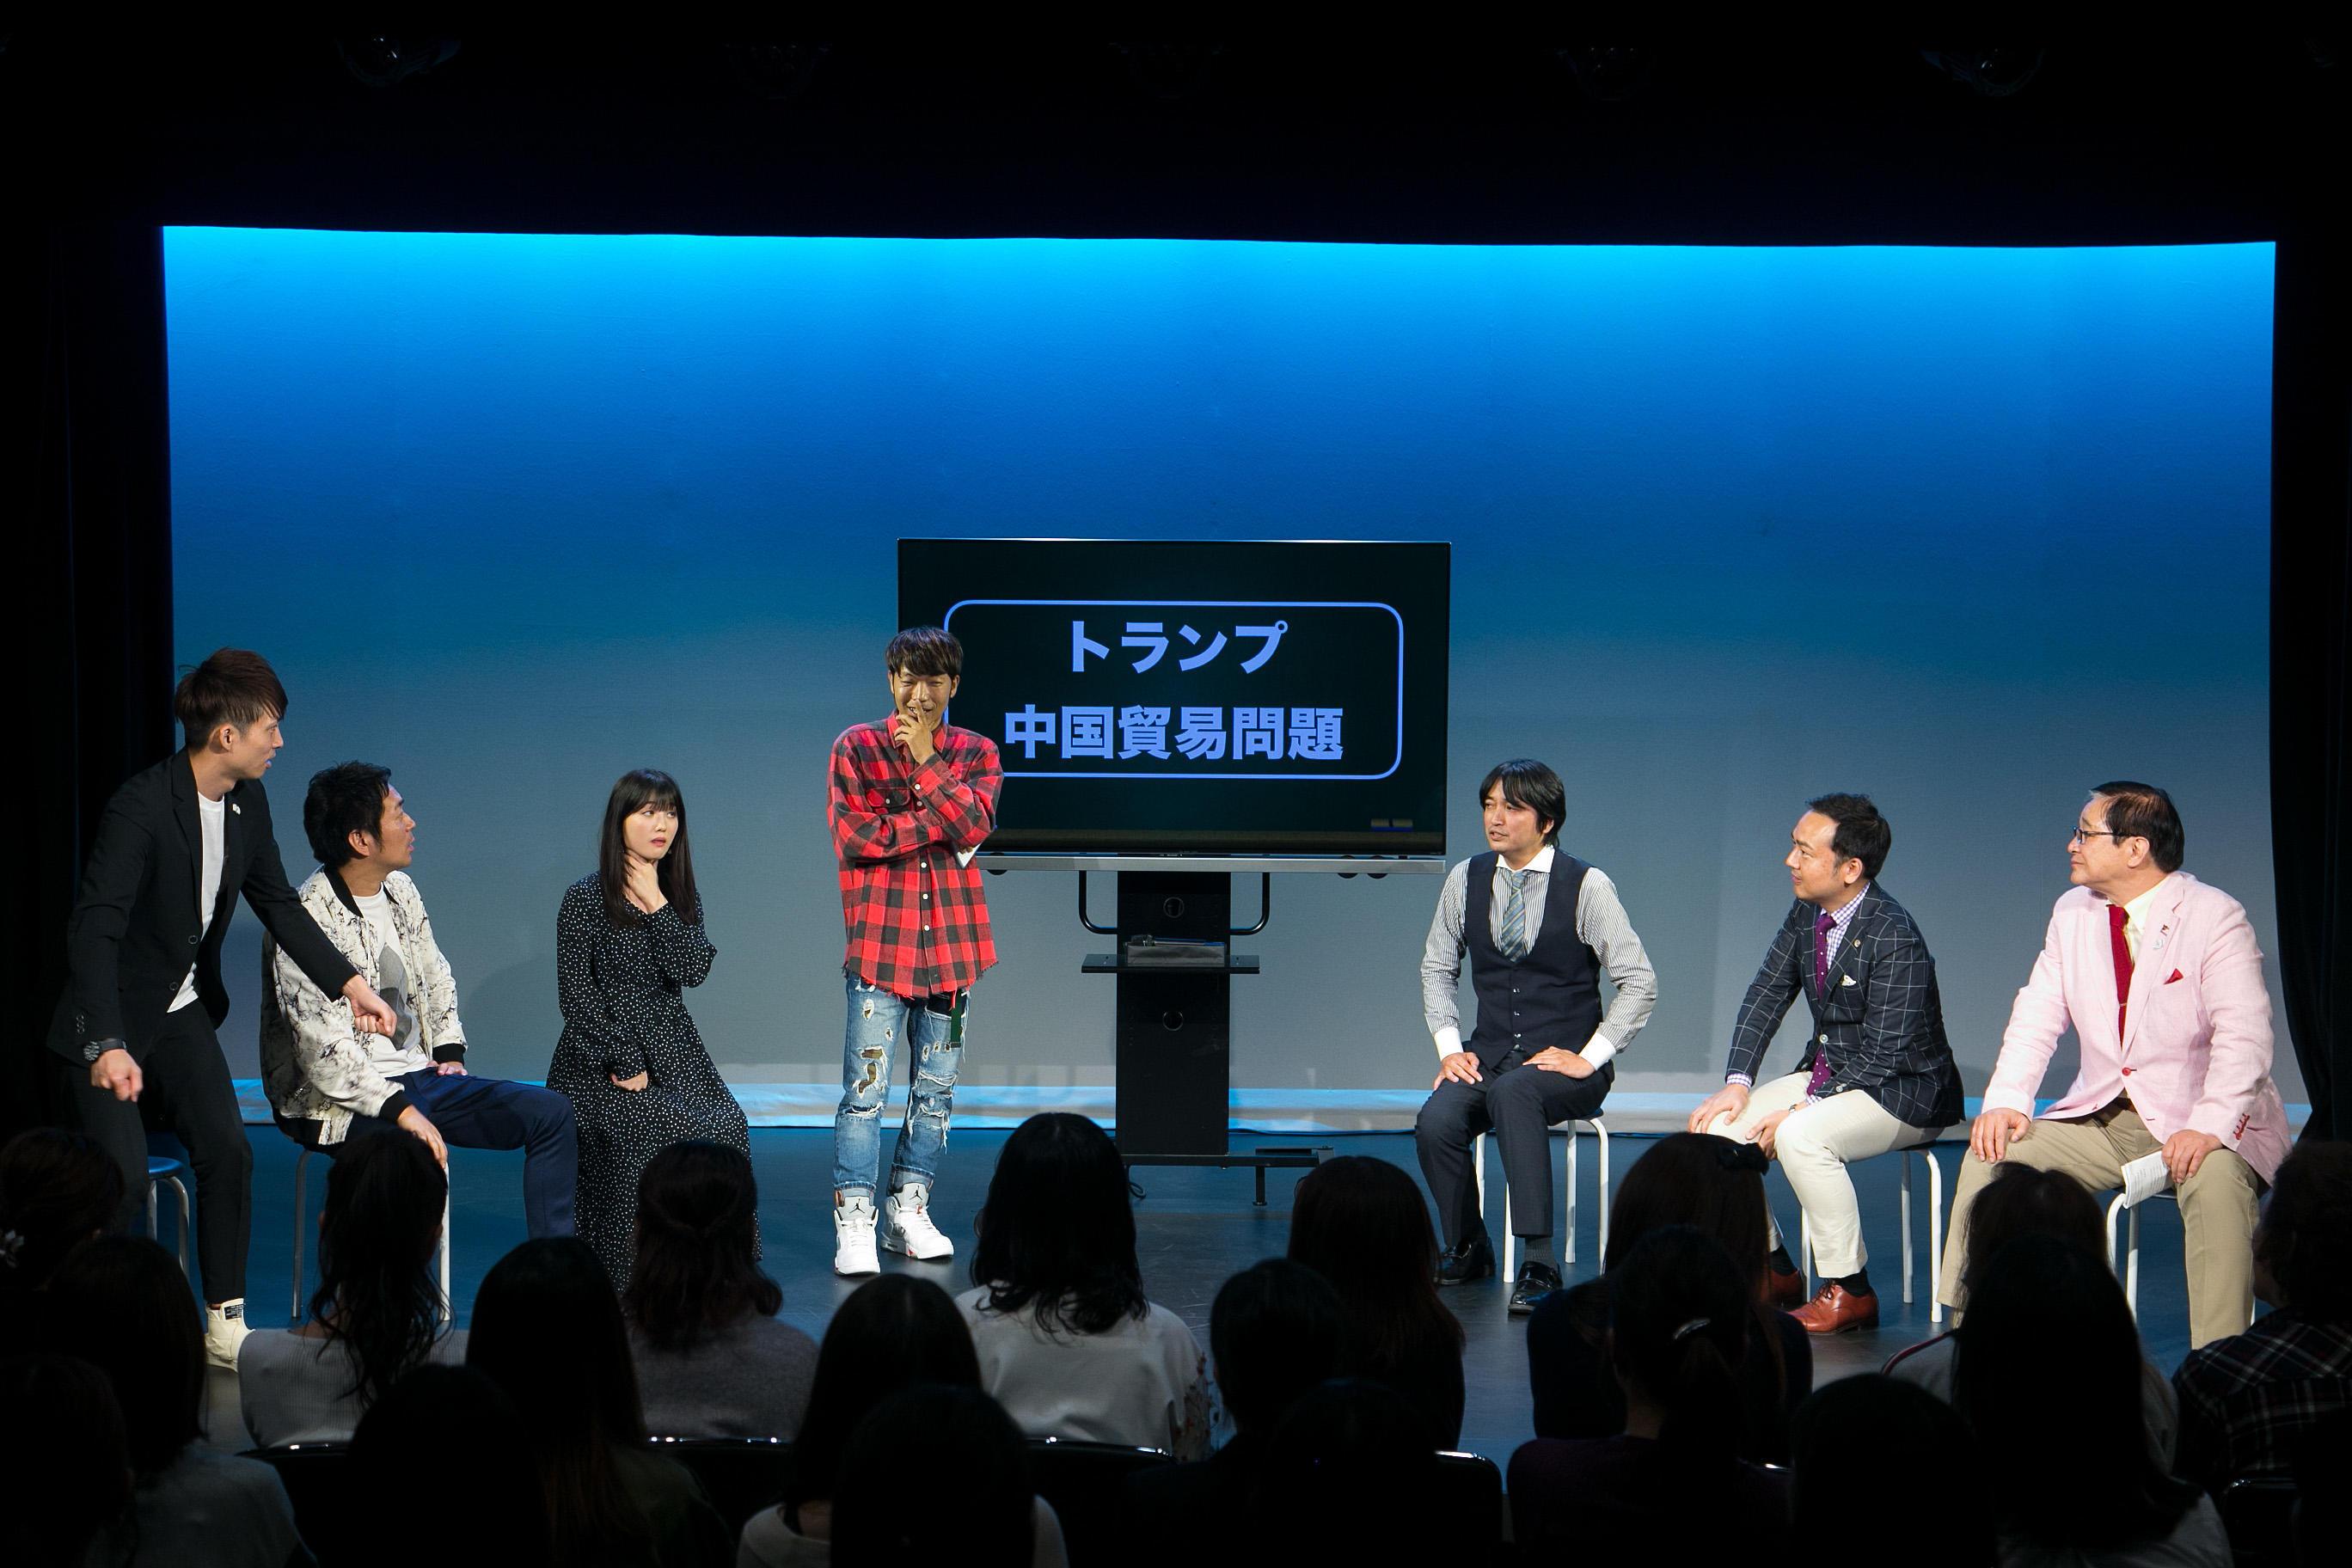 http://news.yoshimoto.co.jp/20181107090922-75c3ea0c0136cc1c83cf3b6bff8d5f920729e651.jpg